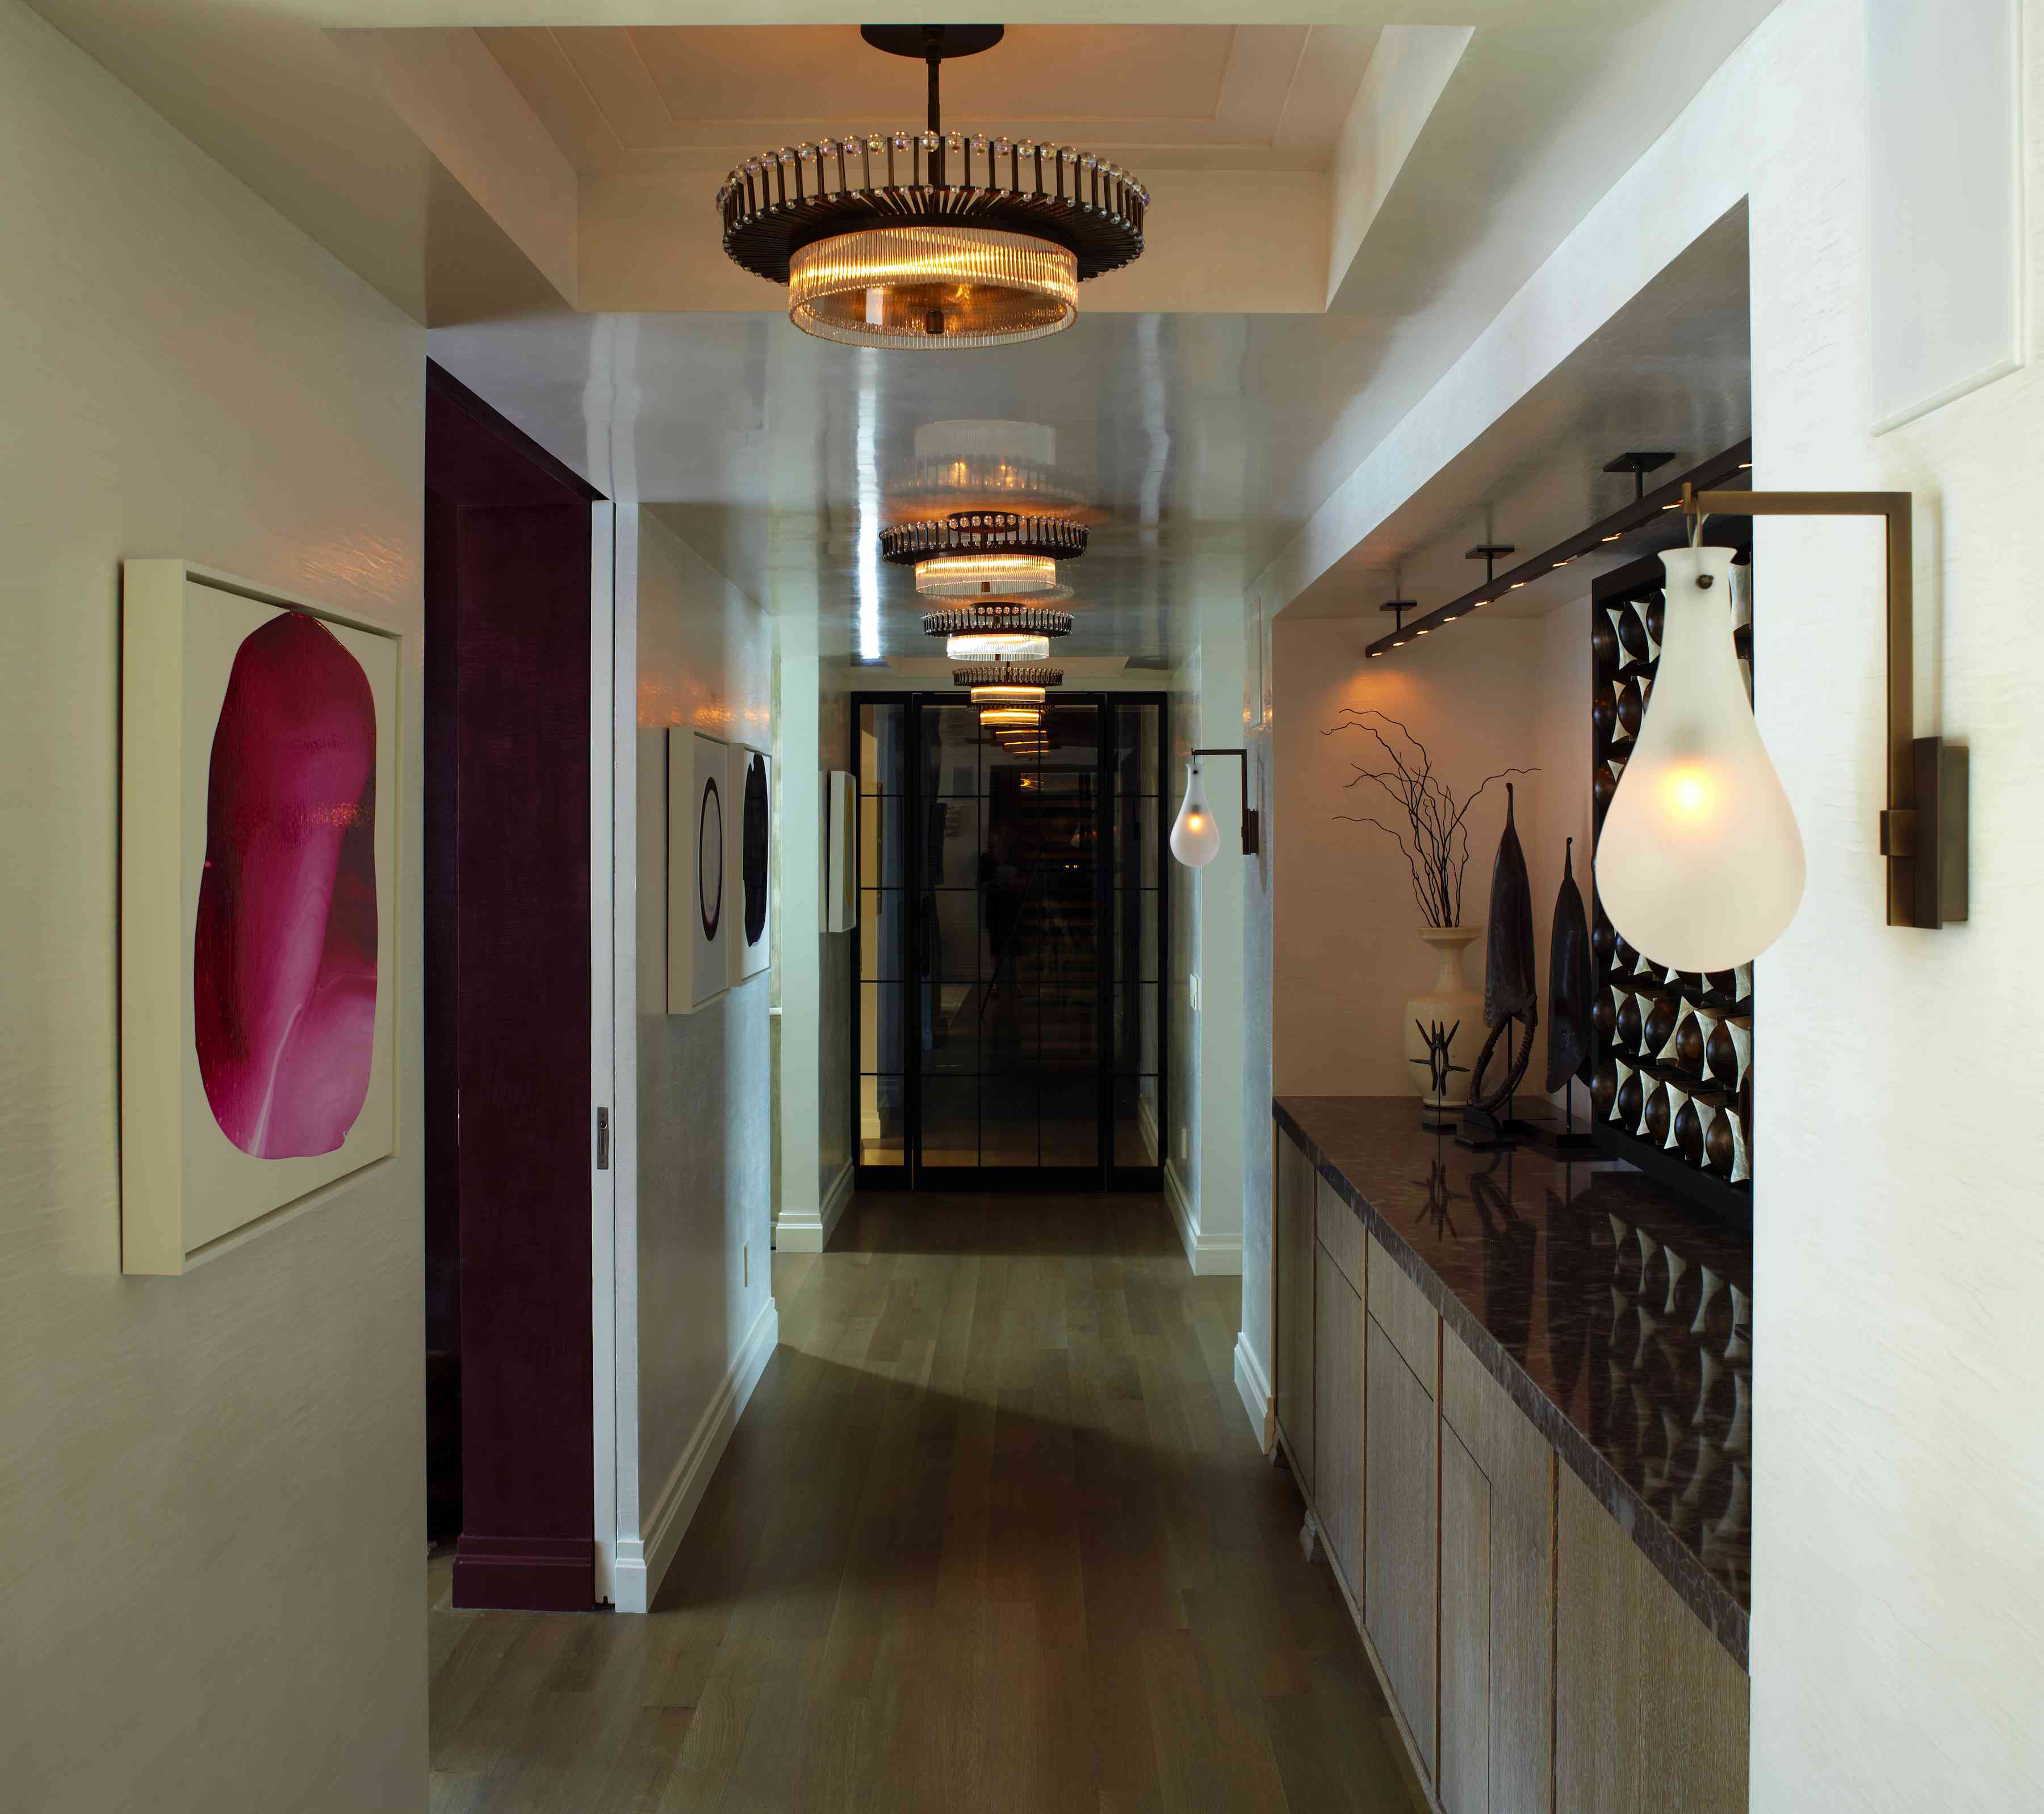 Elegant hallway and lighting.